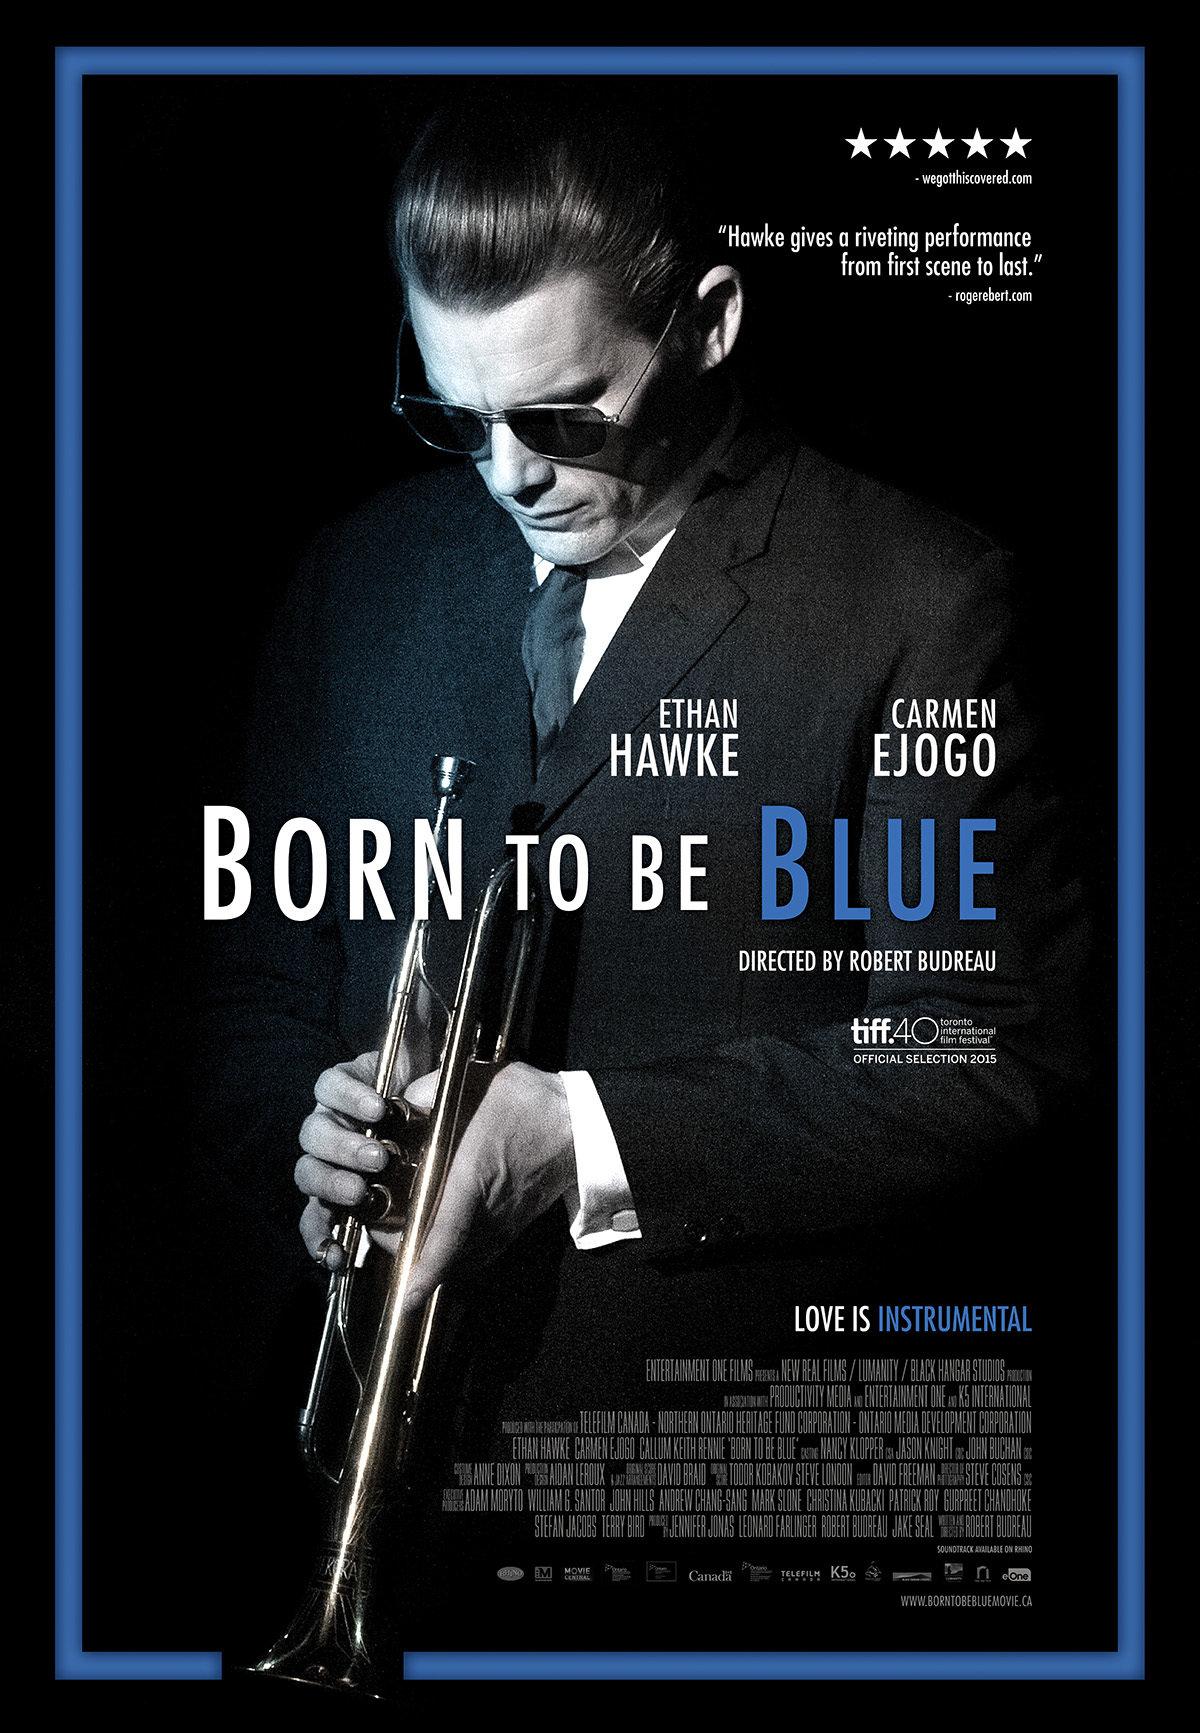 Born to Be Blue(2015) - A l'affiche